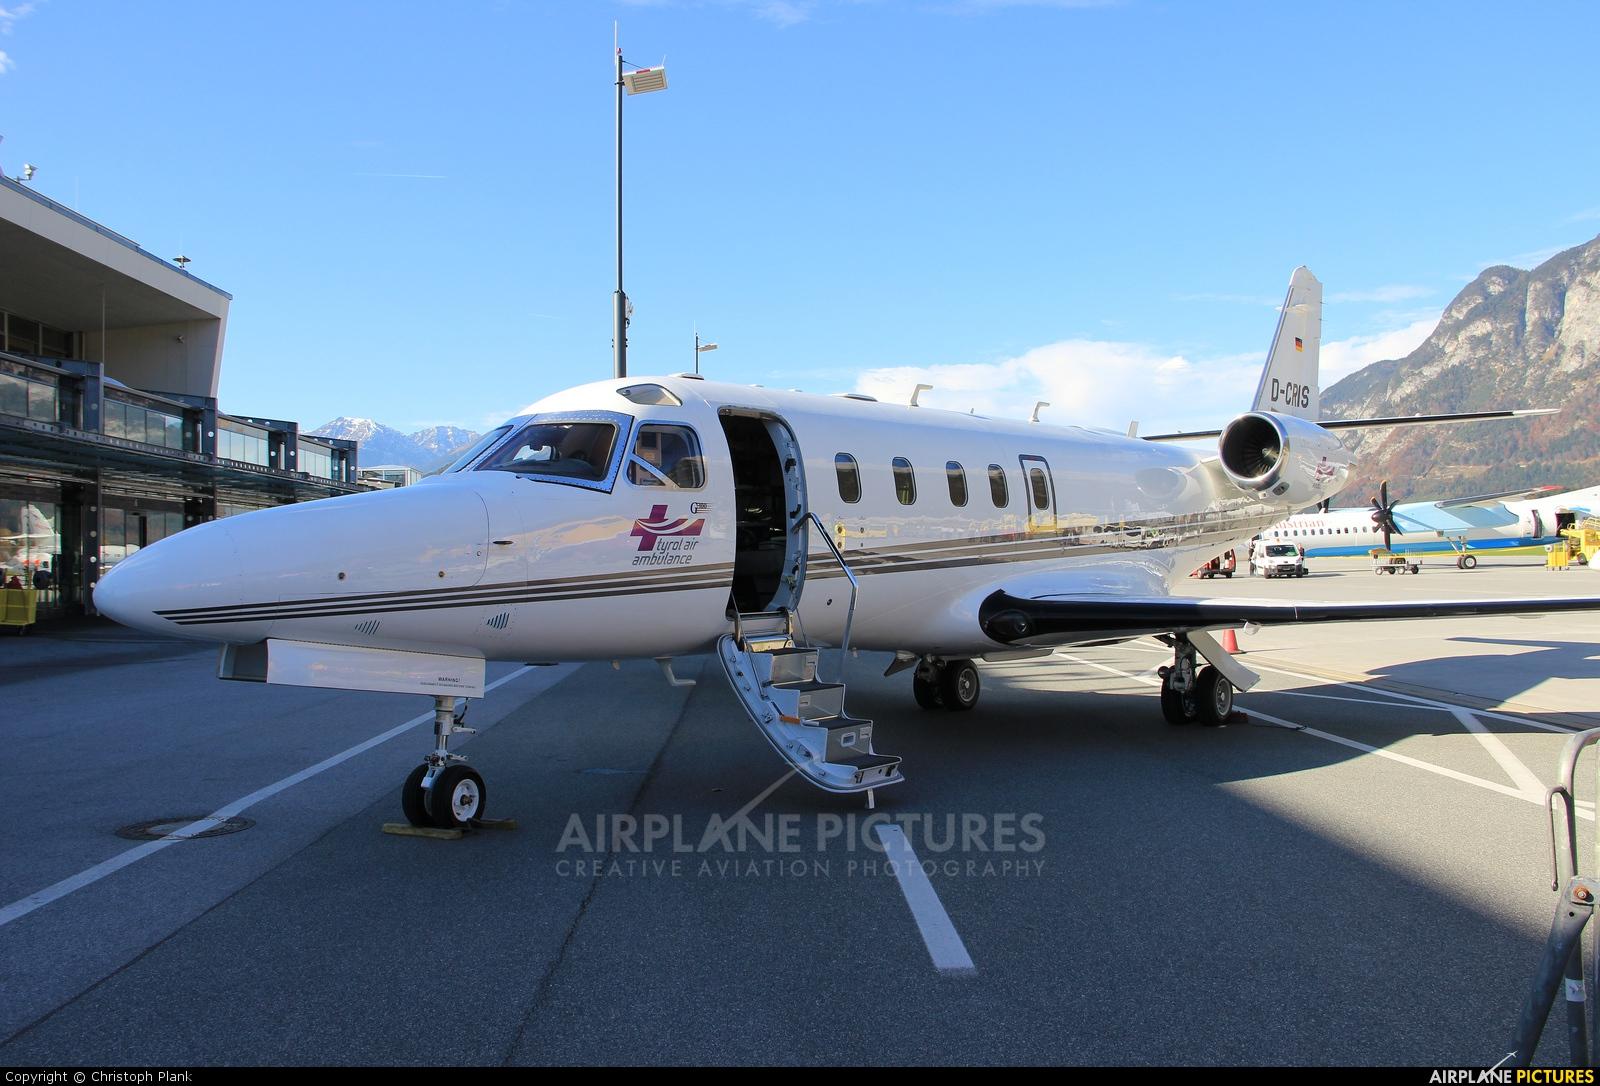 Tyrol Air Ambulance D-CRIS aircraft at Innsbruck